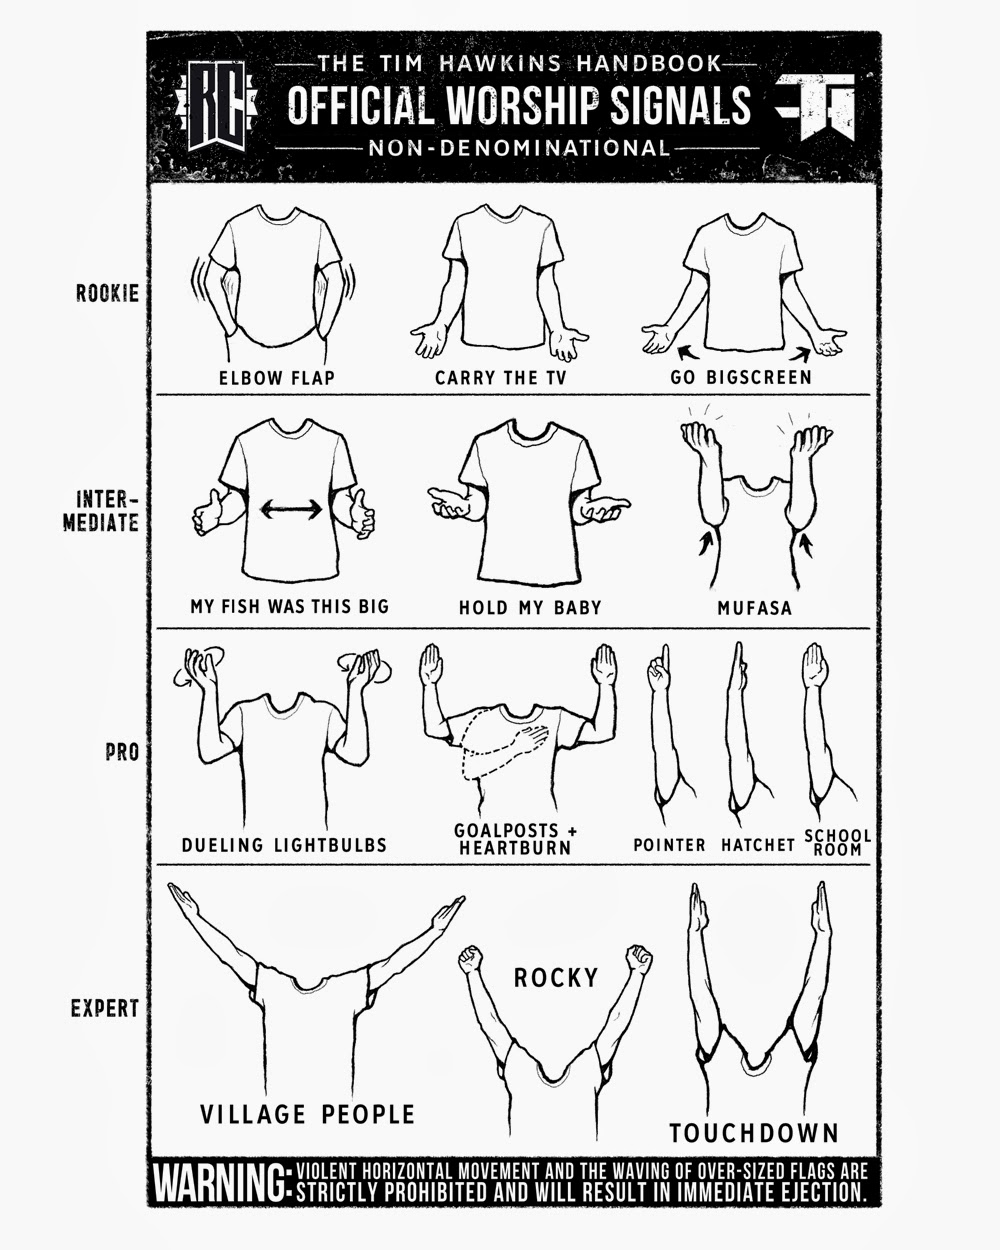 Funny Official Worship Signals - Tim Hawkins Handbook - Non-denominational